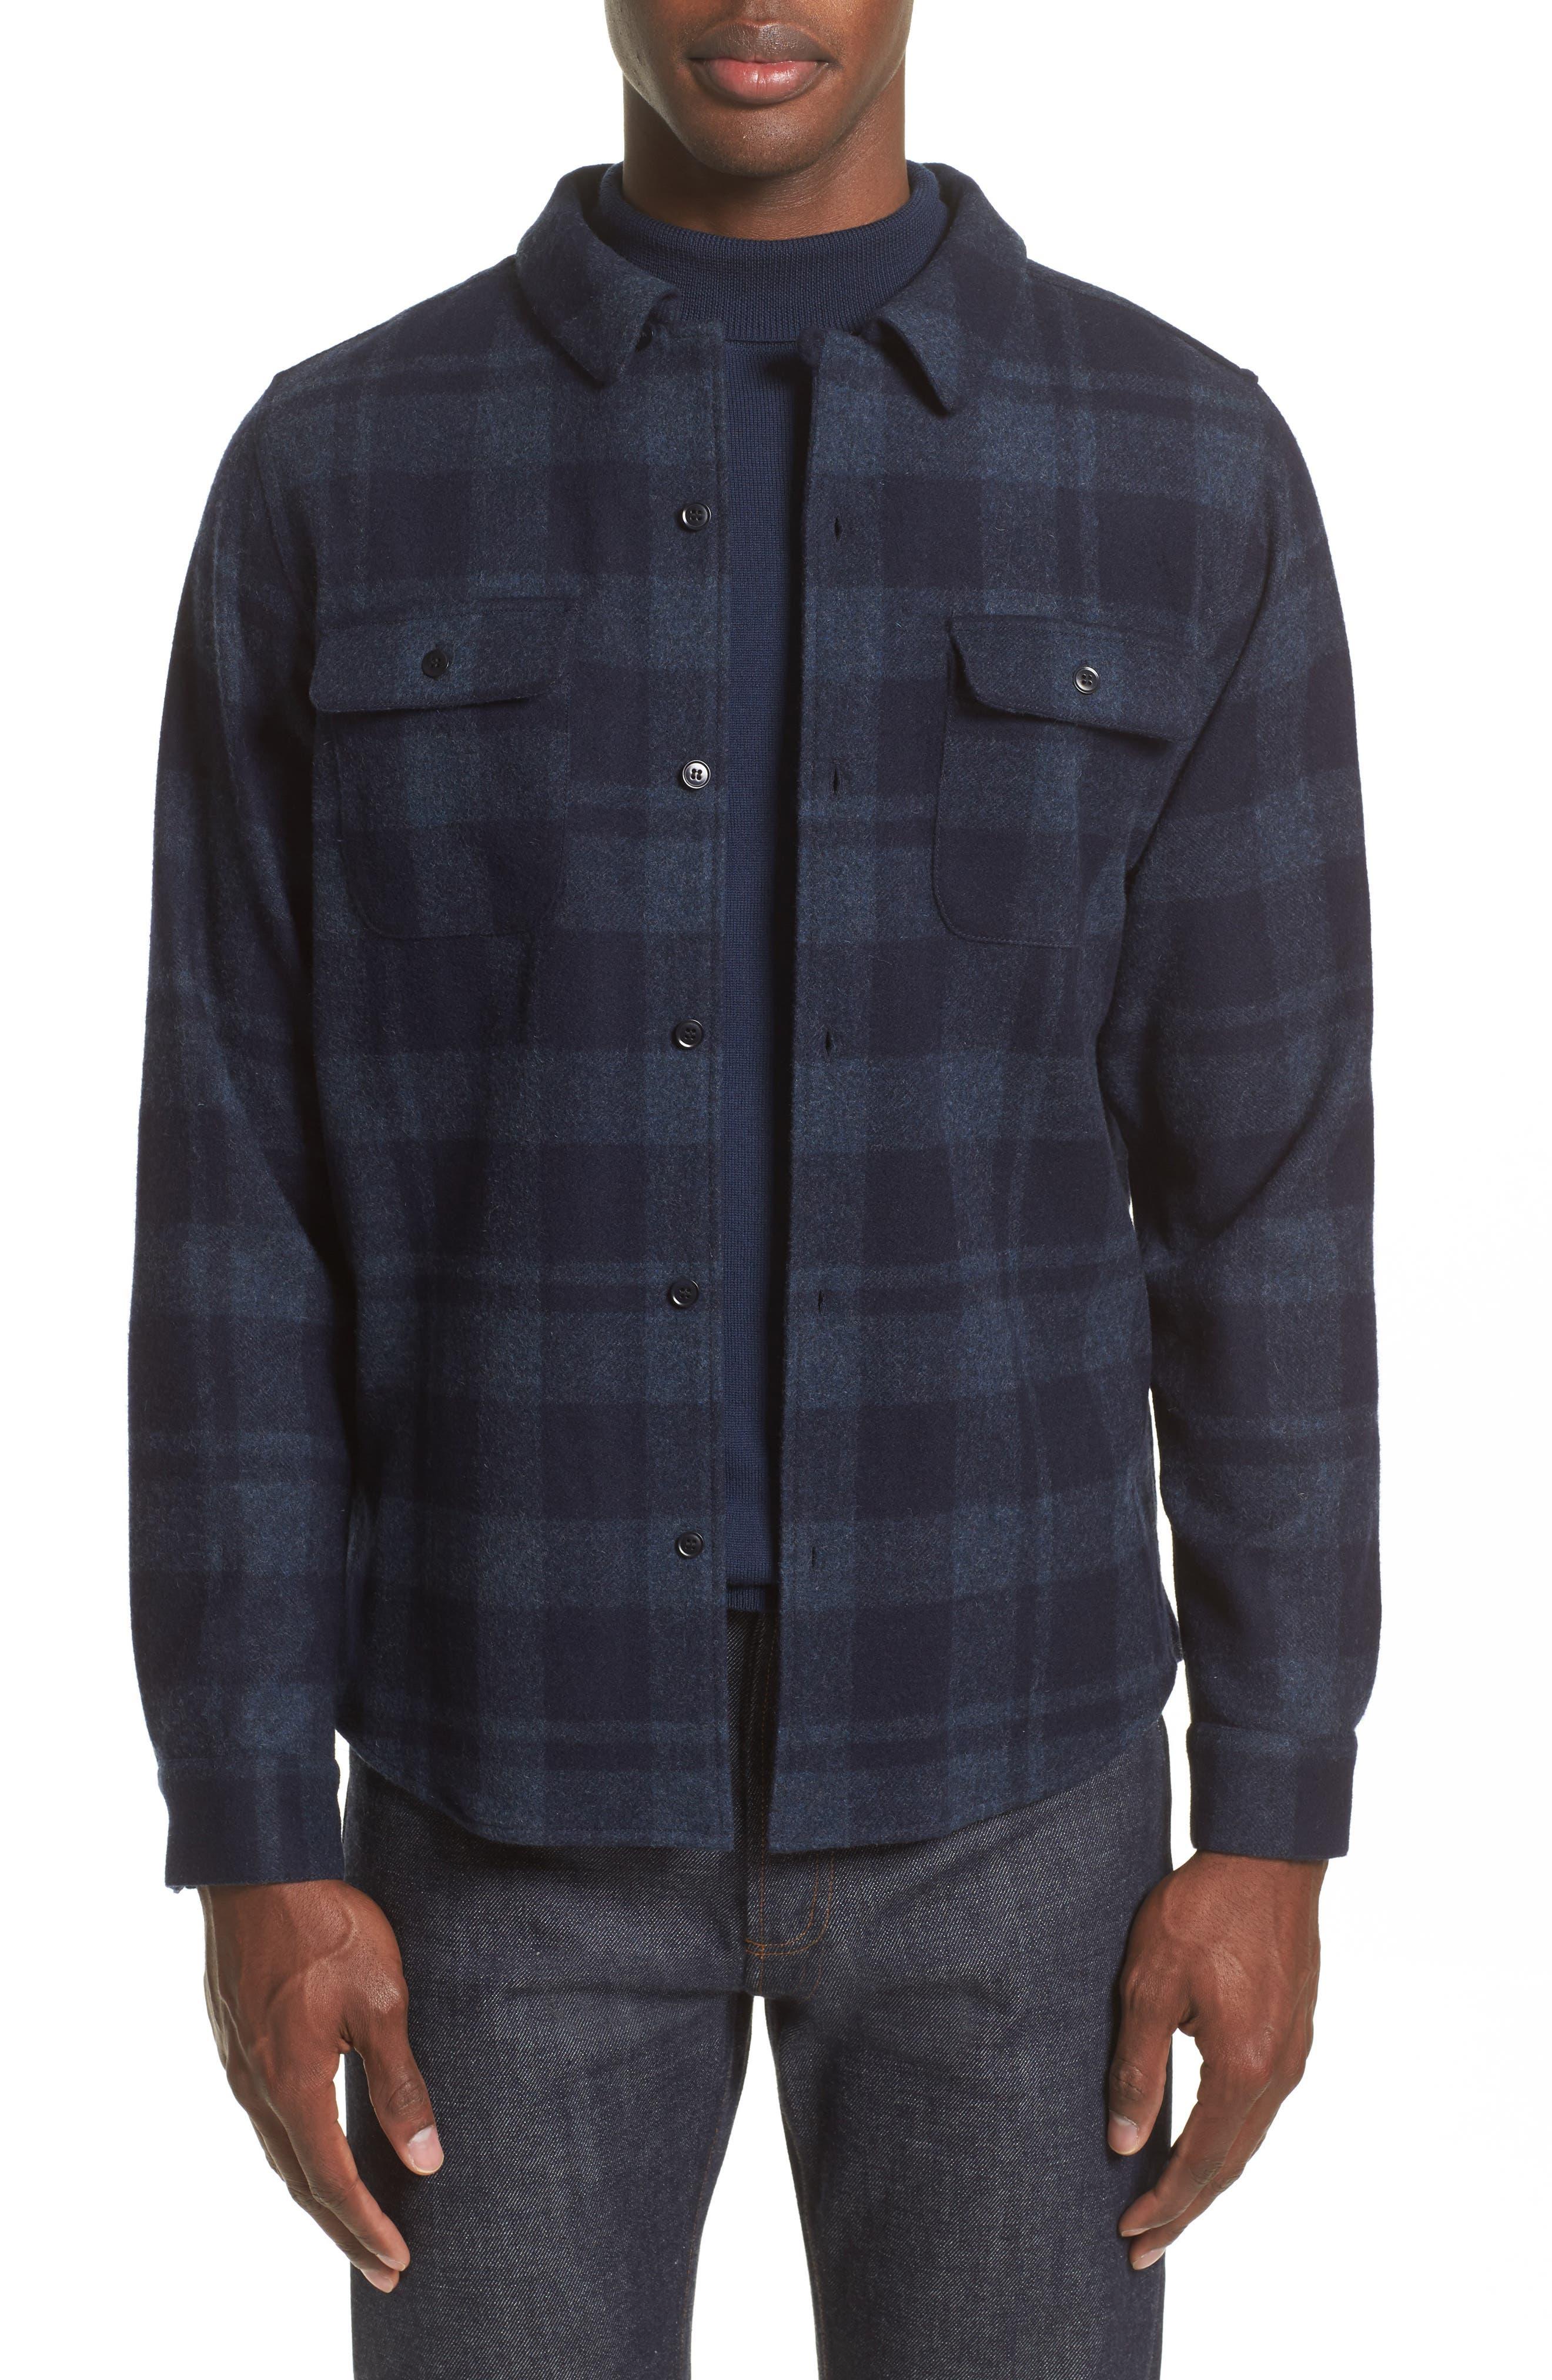 A.P.C. Flannel Plaid Shirt